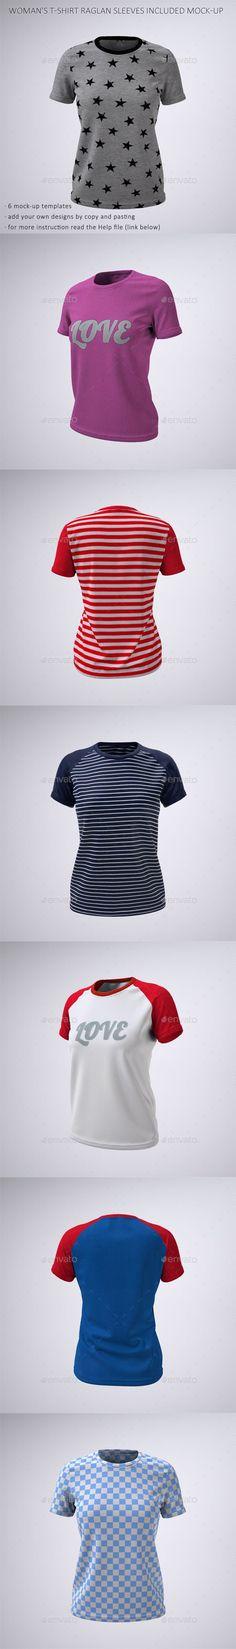 Download Woman S T Shirt With Short Or Raglan Sleeves Mock Up T Shirts For Women Clothing Mockup Raglan Sleeve Shirts